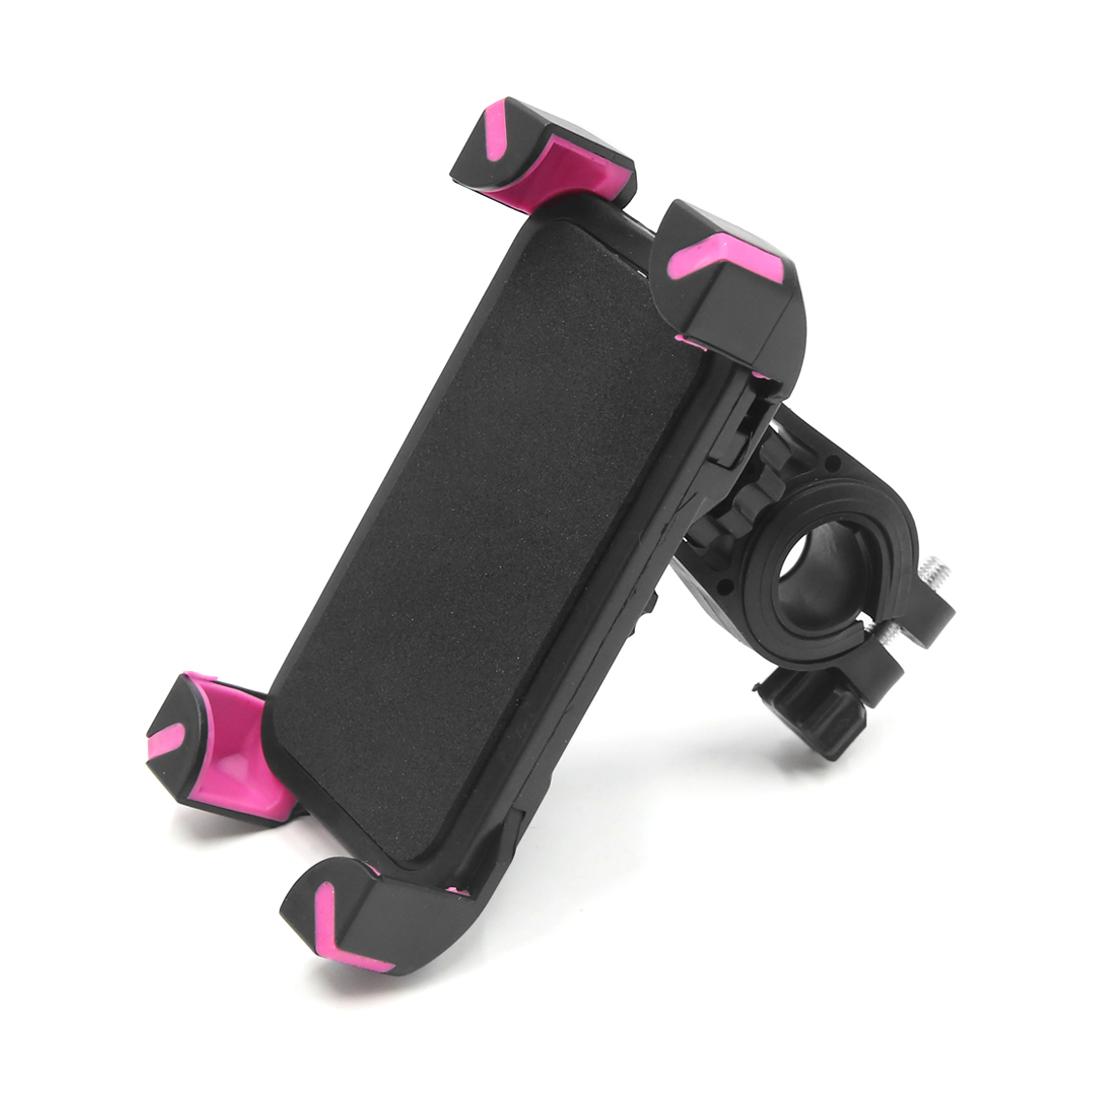 Red 360 Degree Rotation Bicycle Bike Handlebar Phone Mount Holder Cradle